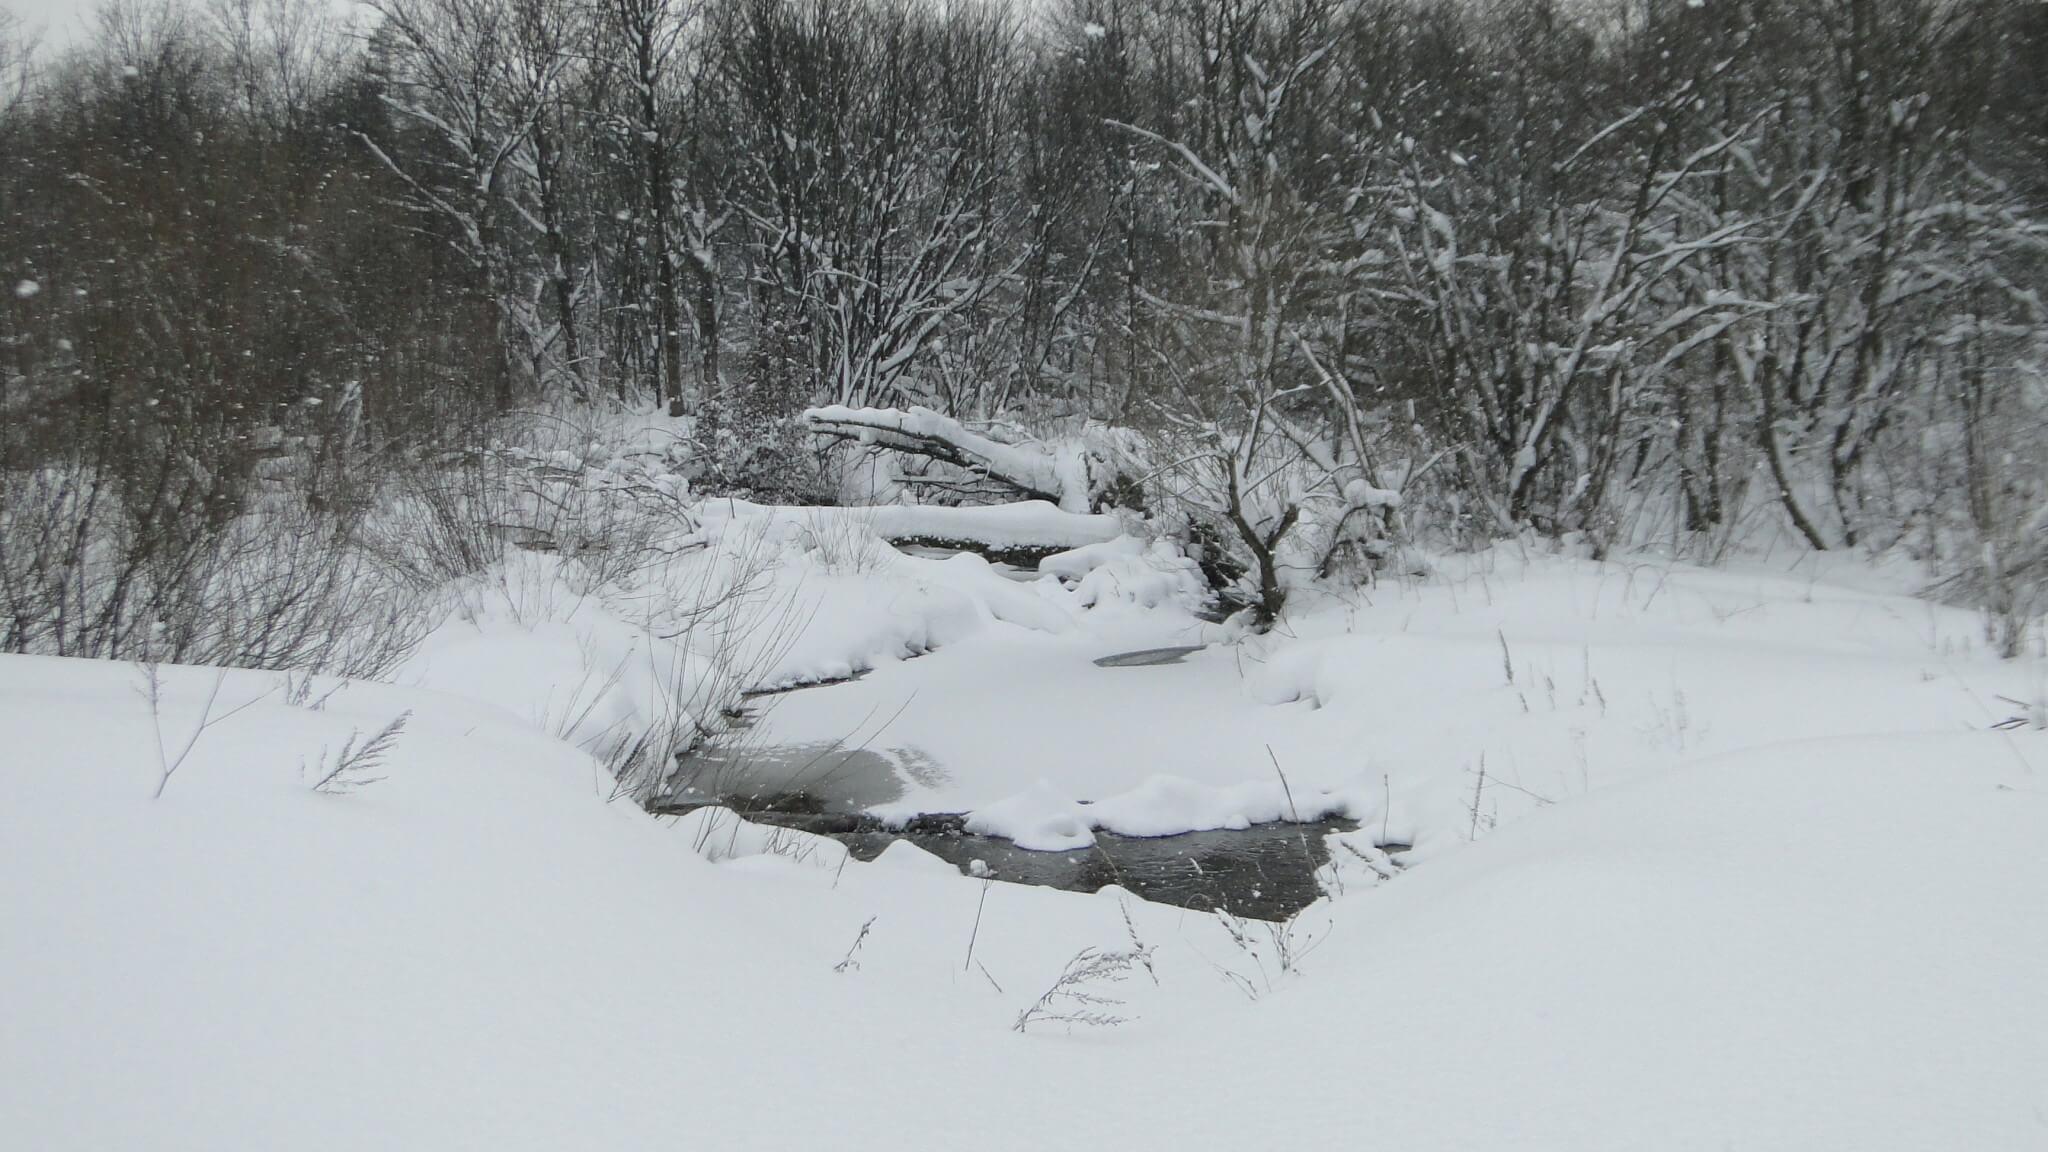 Śnieg,  śnieg, śnieg!... 9